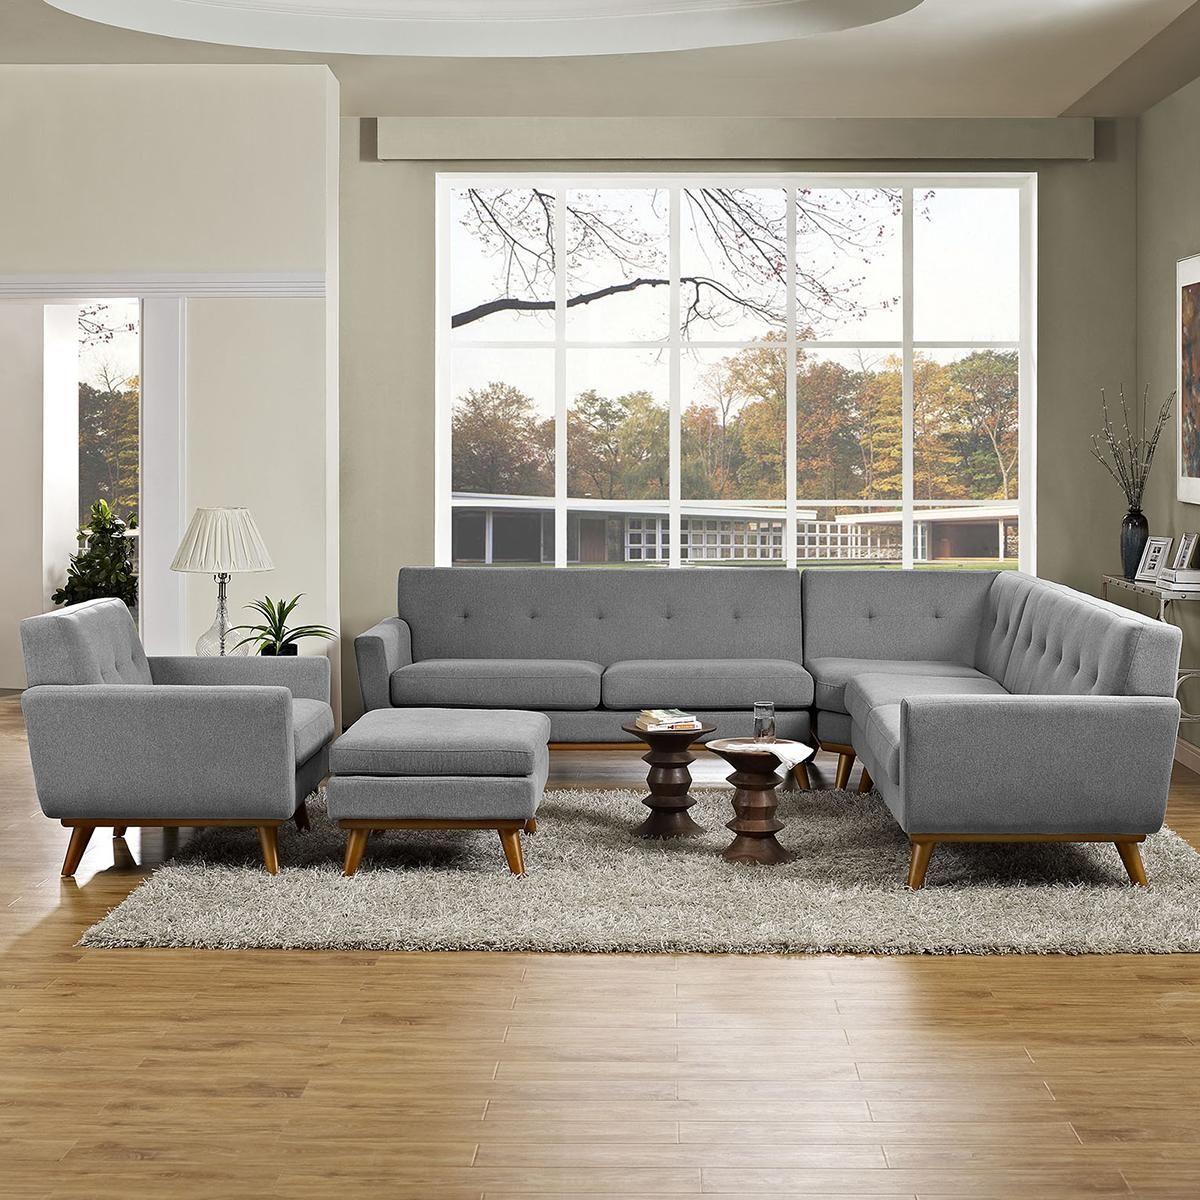 Modway Engage 5 Piece Living Room Set In Gray Nebraska Furniture